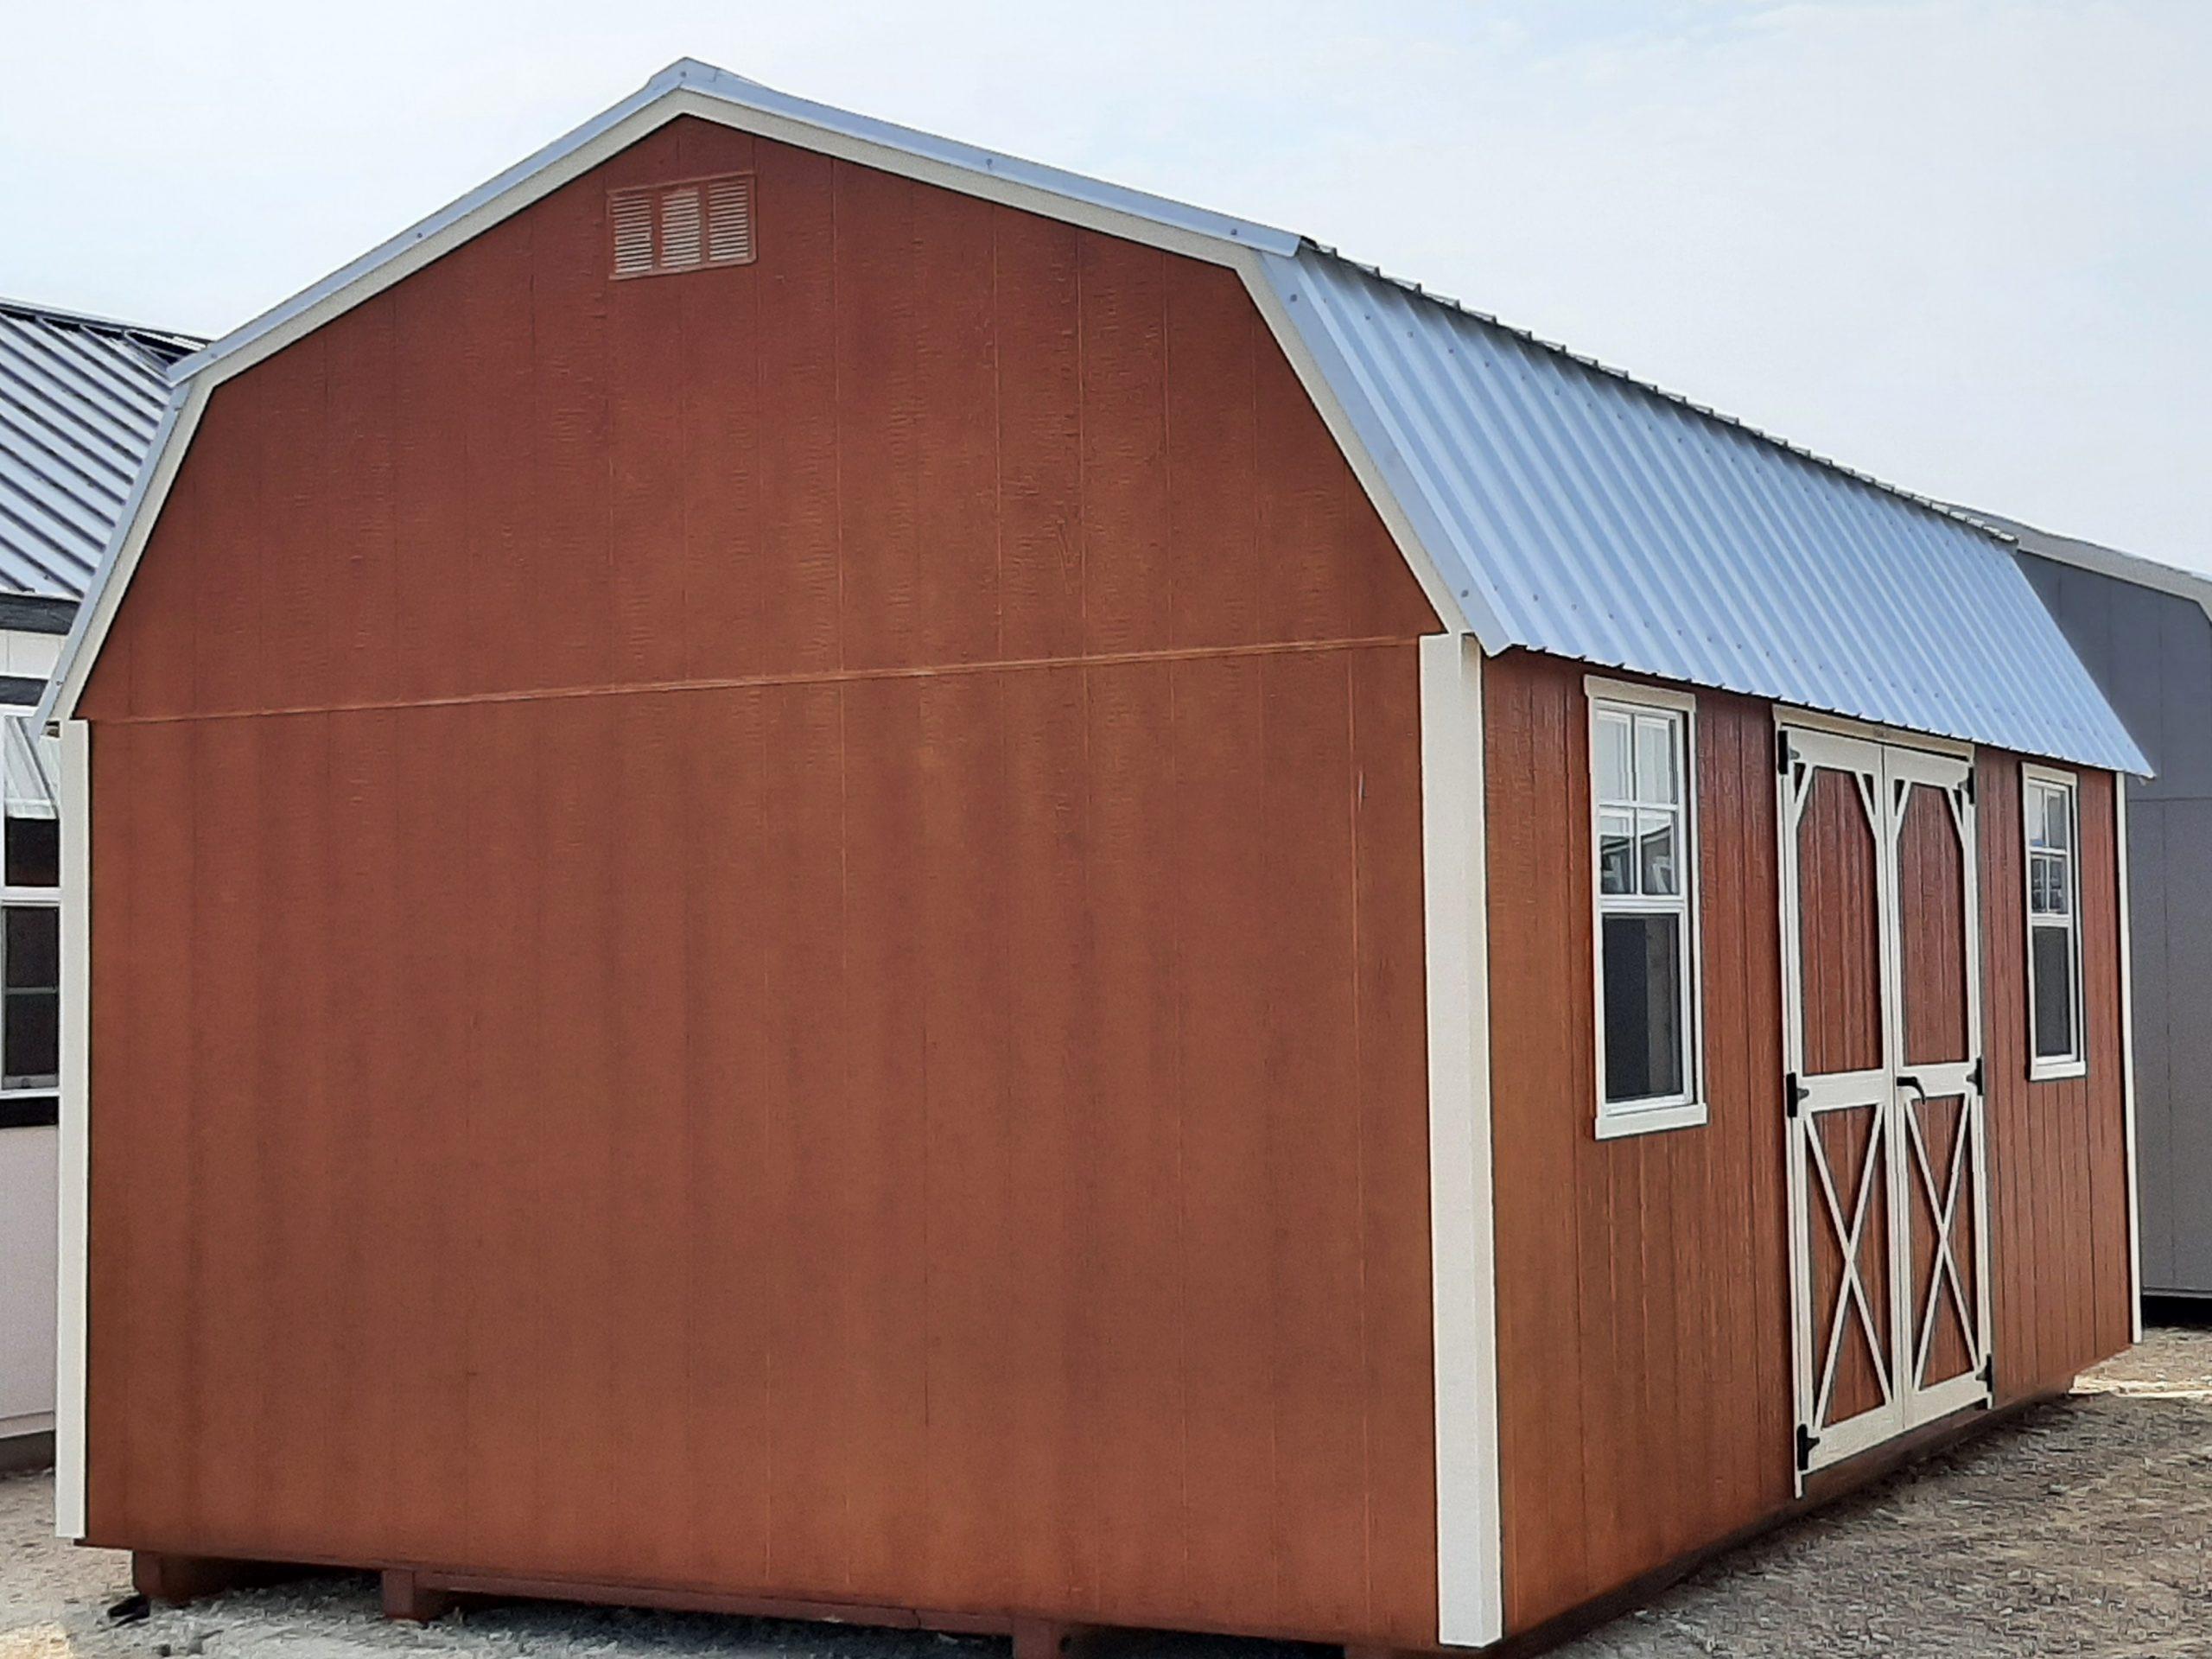 12x20 Lofted Barn #2257 Image